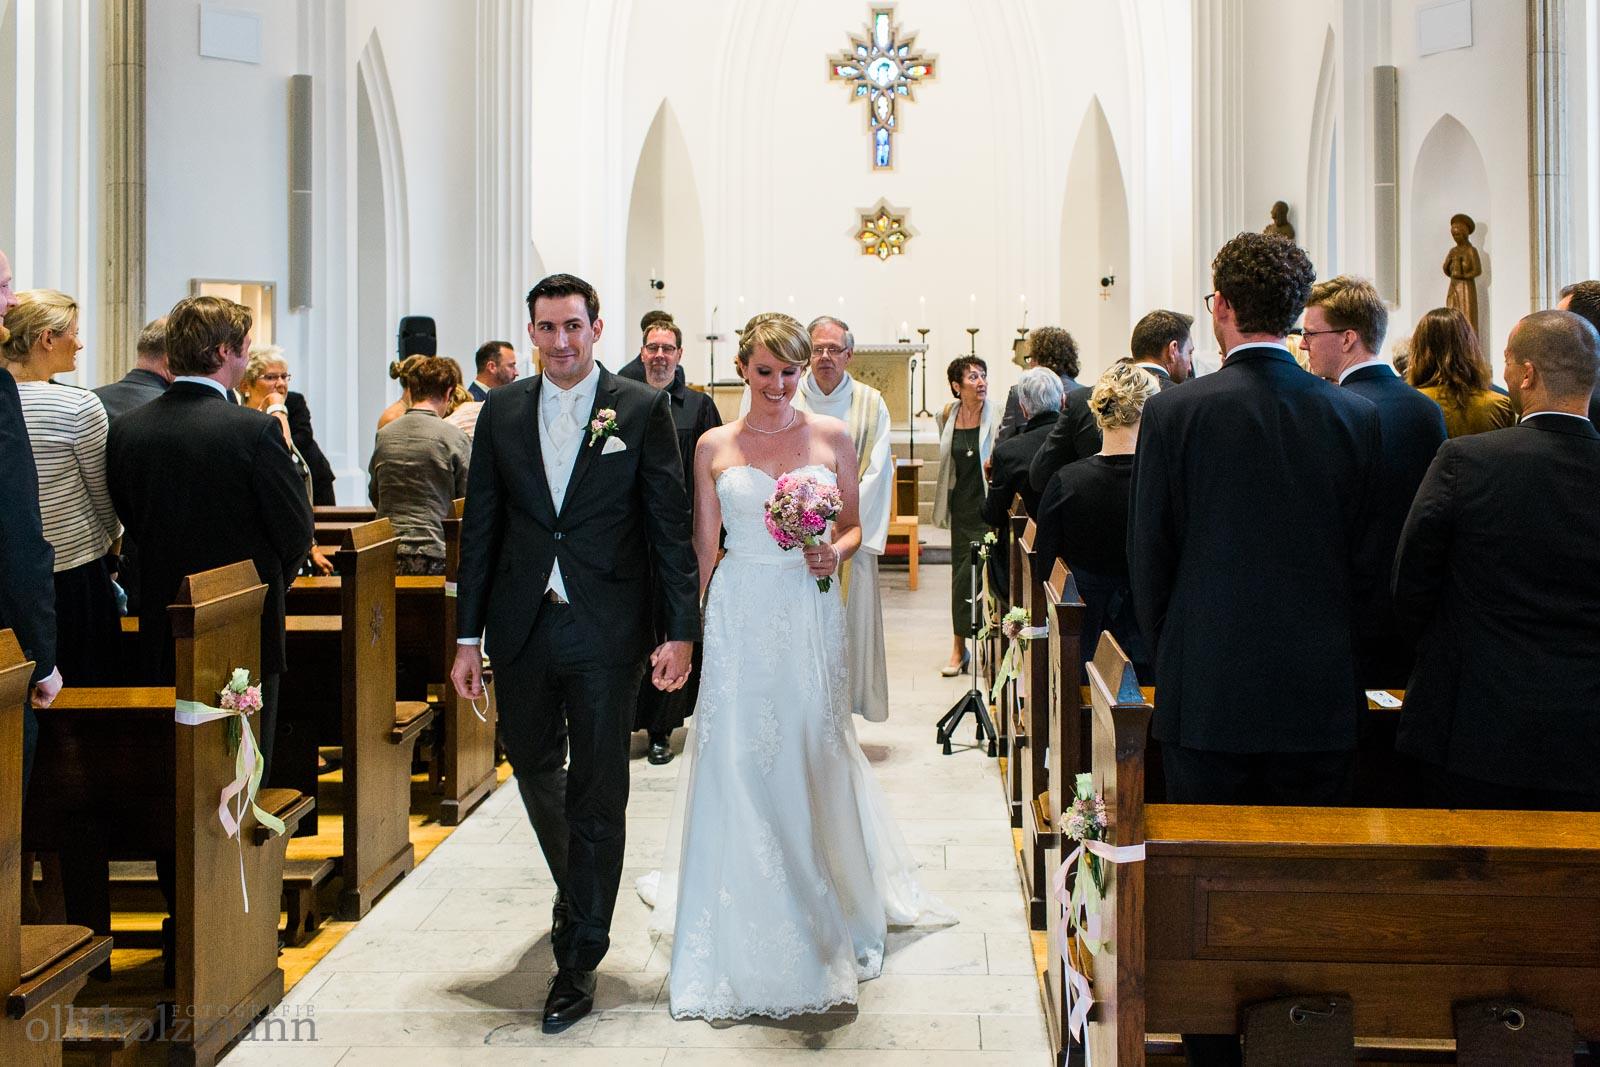 Hochzeitsfotograf nrw-55.jpg